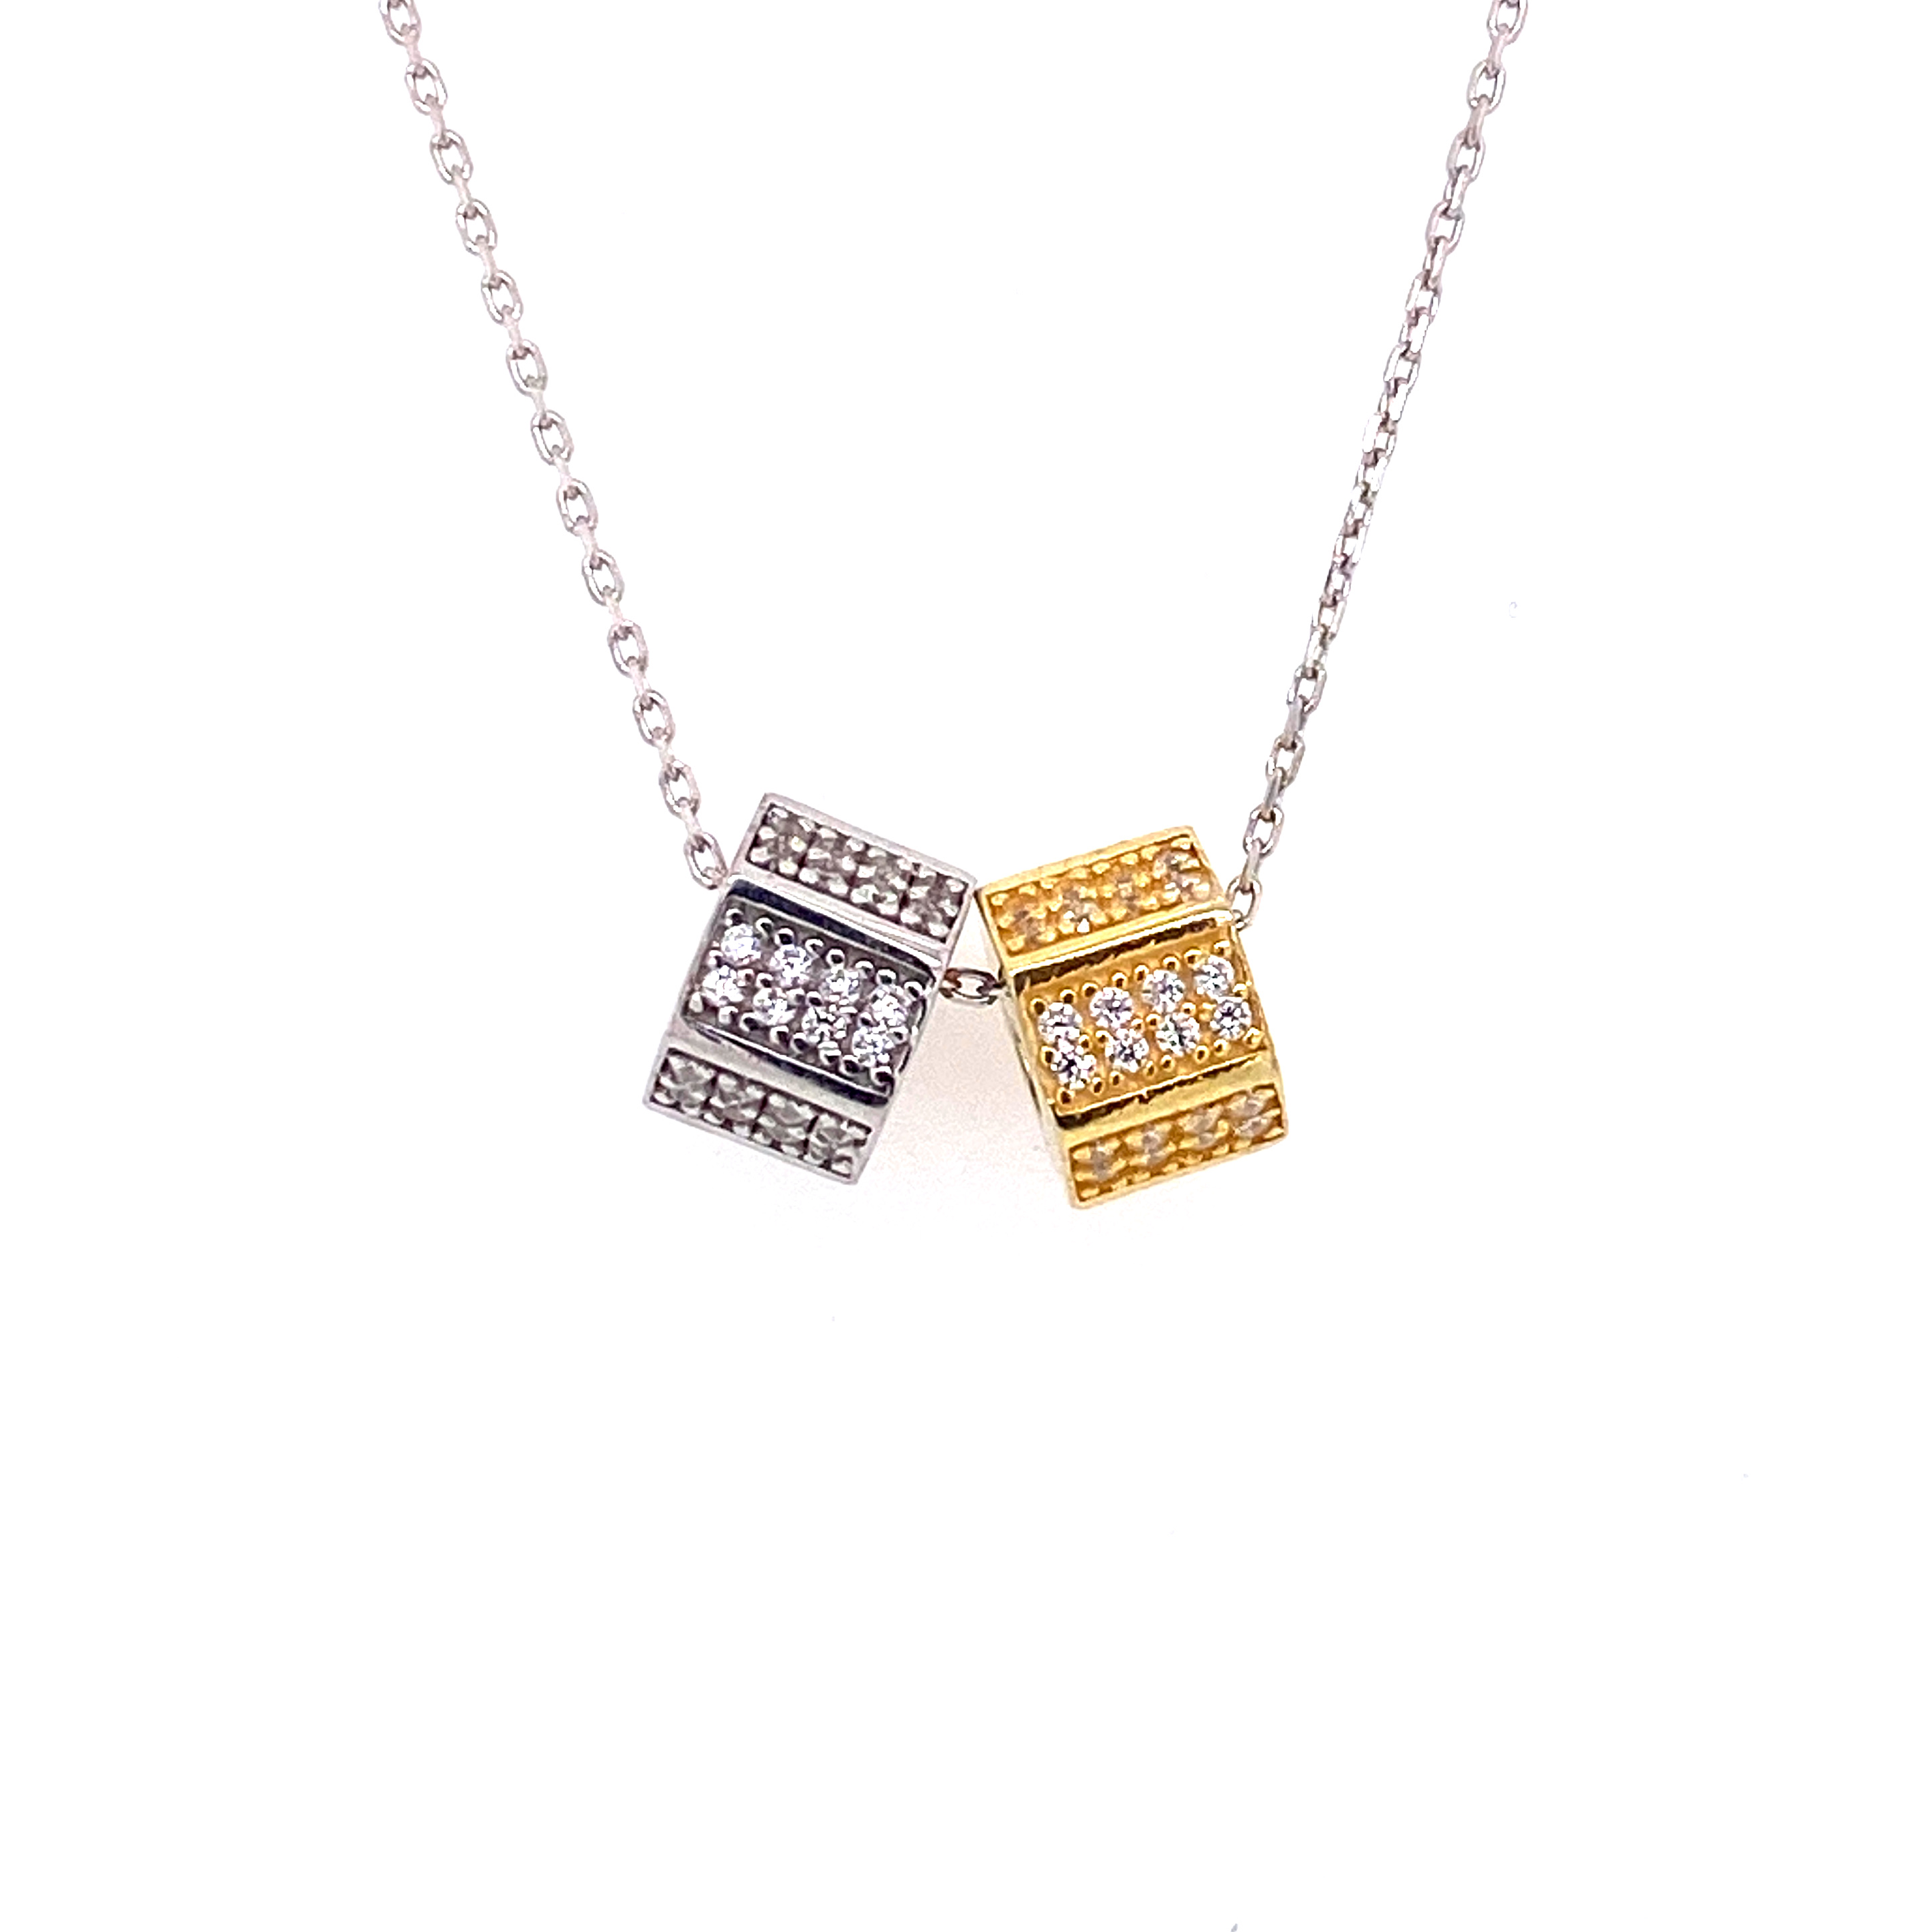 925 Silber Halskette | Sechseck